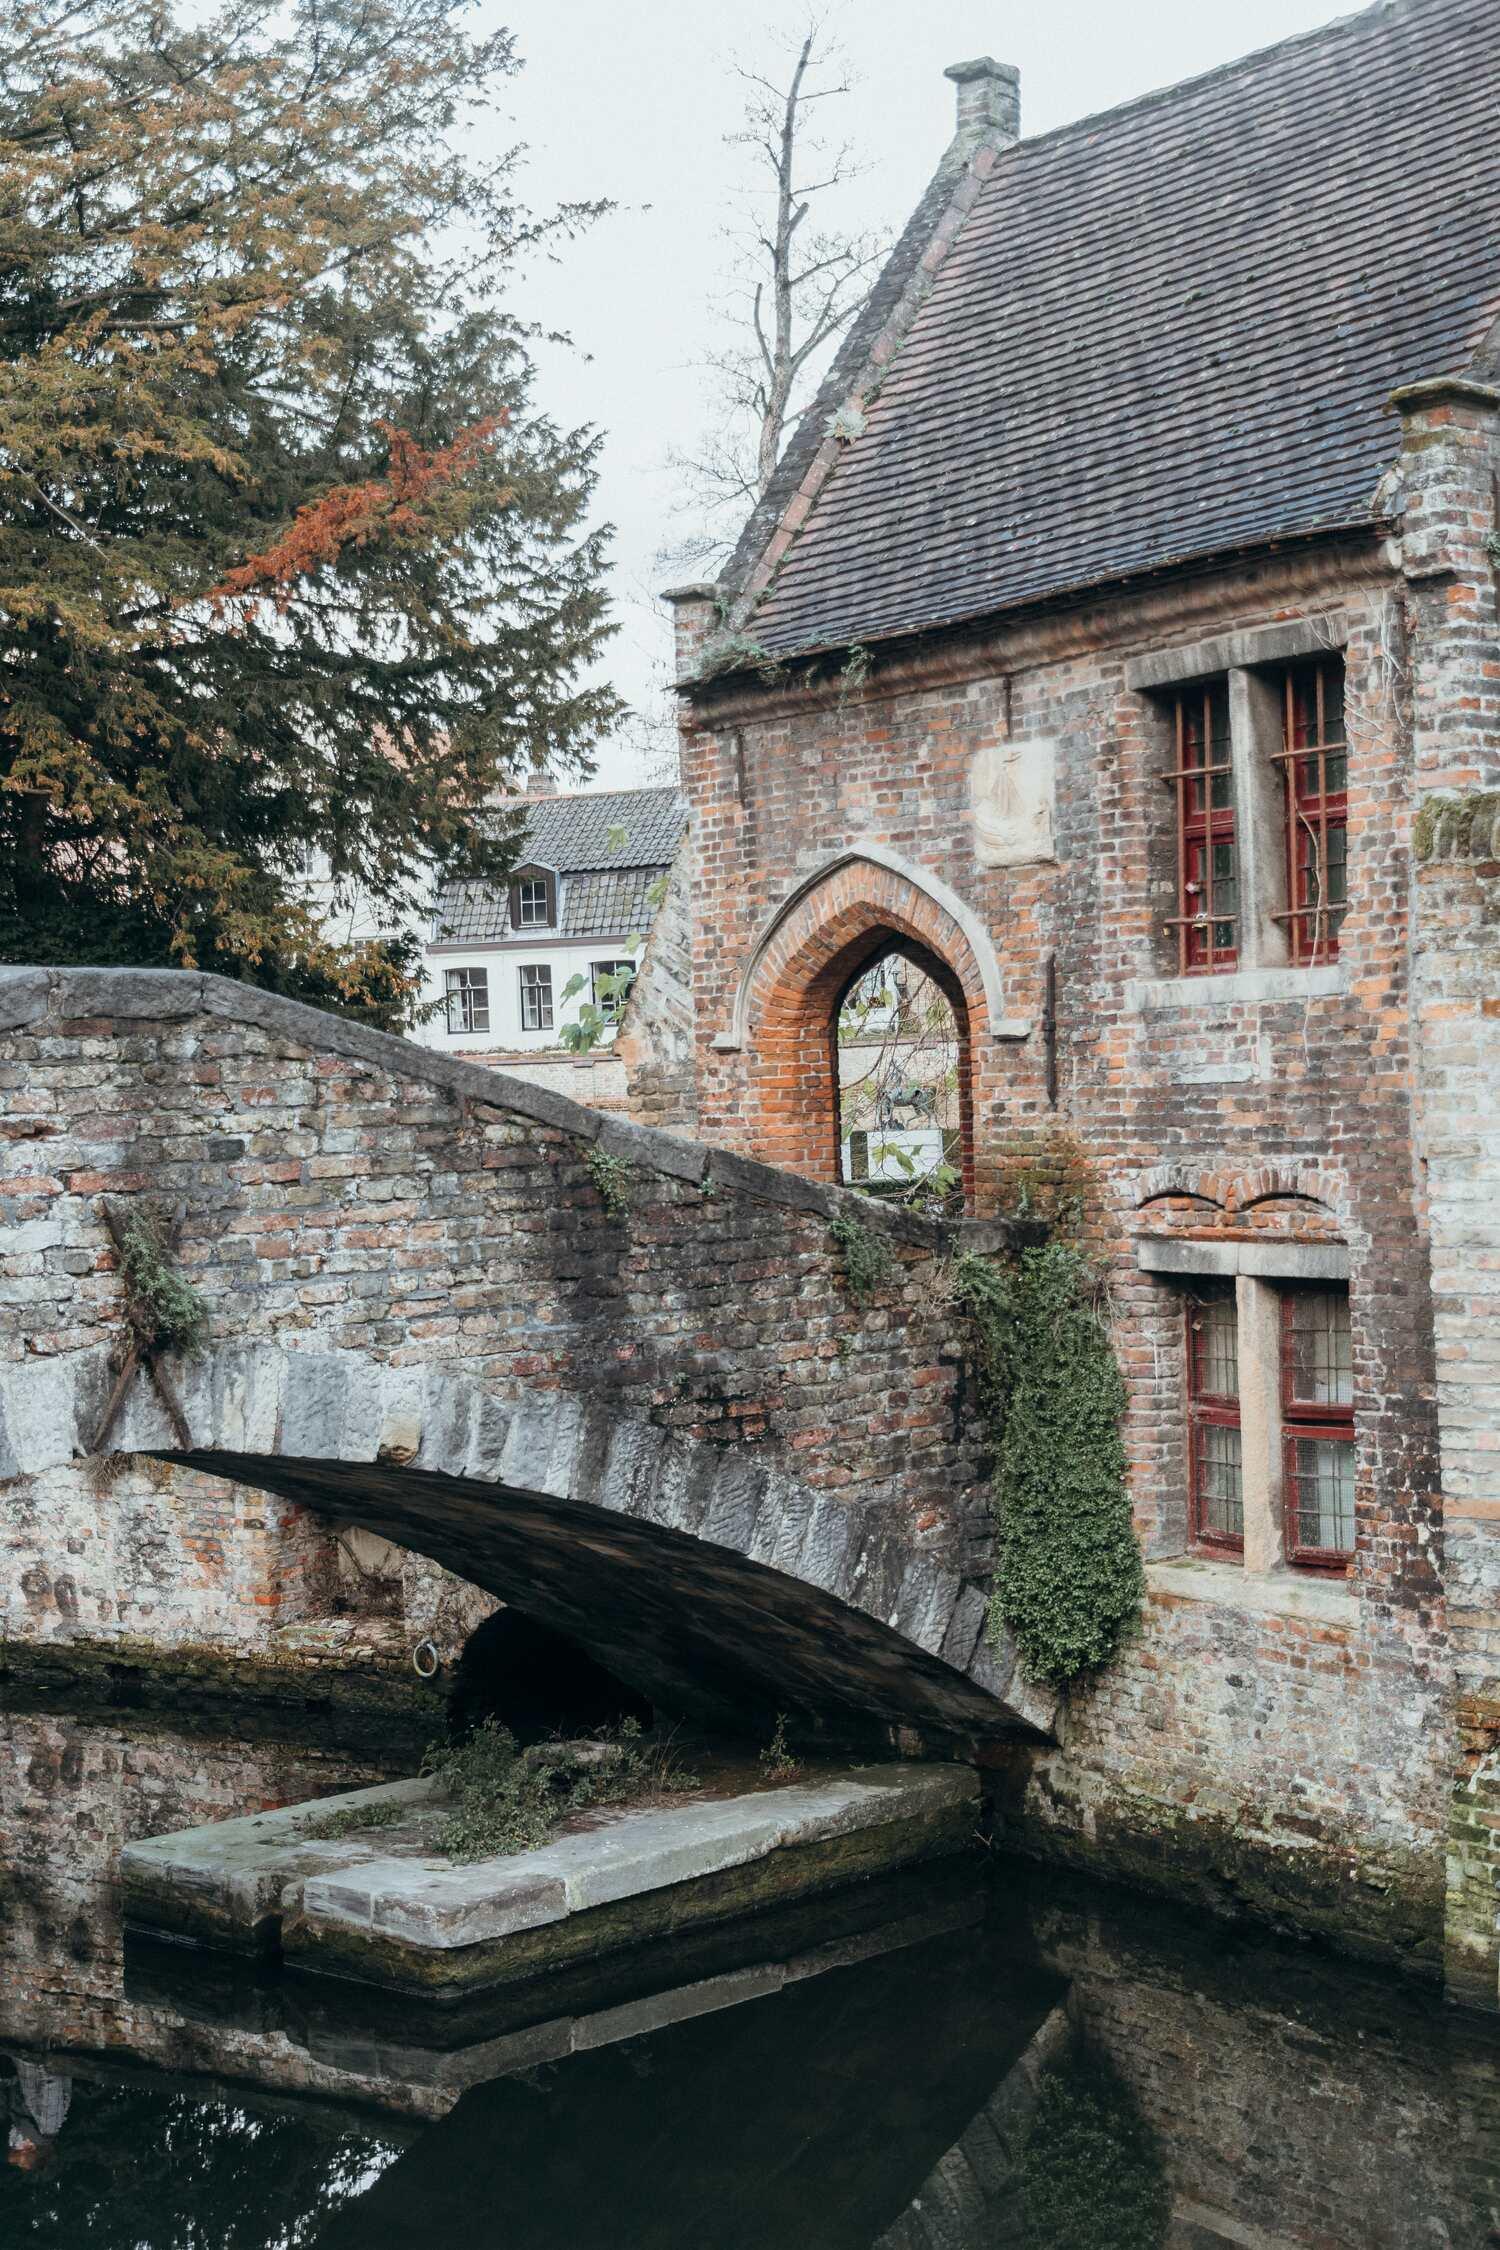 The Bonifacius Bridge at Bonifacius Brug one of the most famous and must visit spots in Bruges